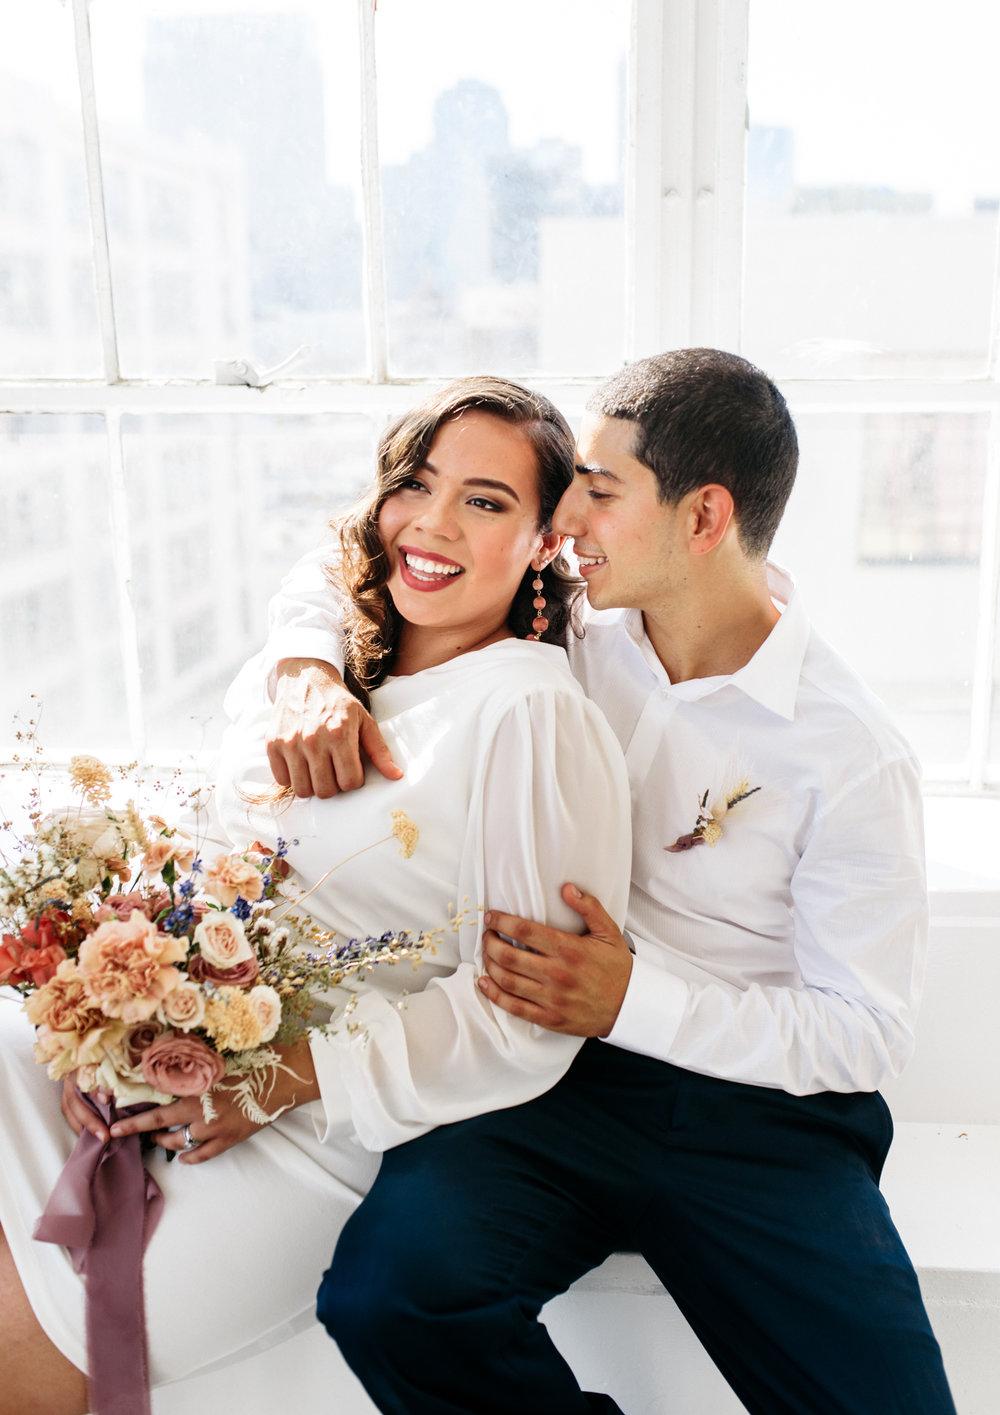 SamErica Studios - Lavender Lemonade Modern Bridal Editorial -30.jpg